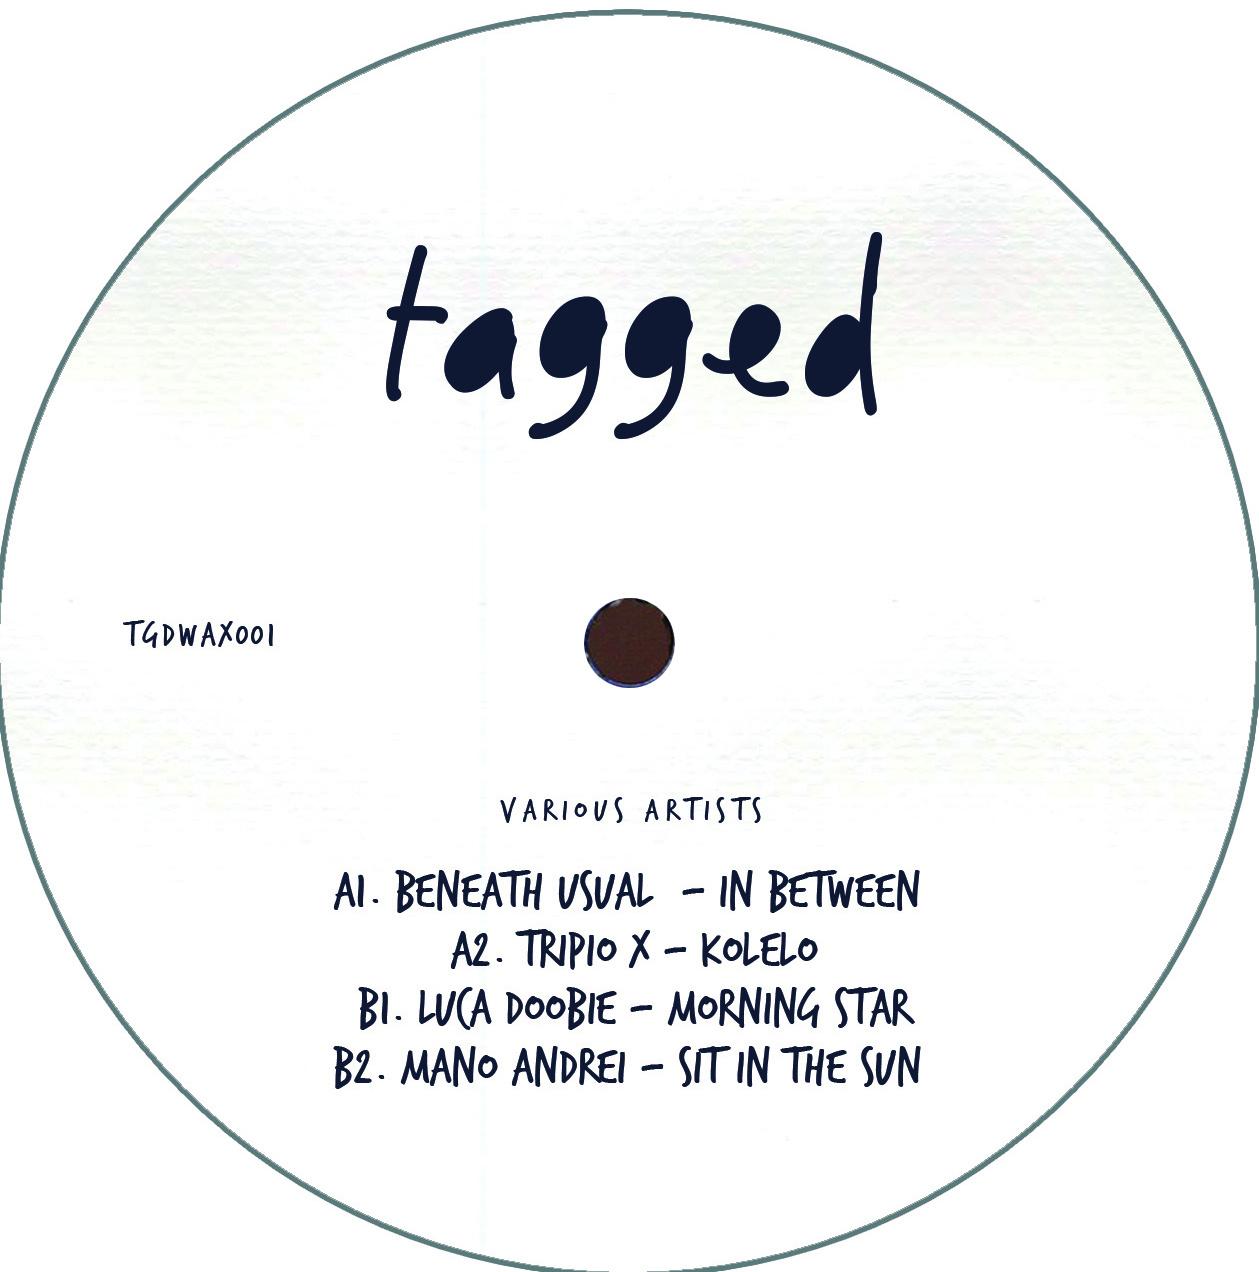 TGDWAX001